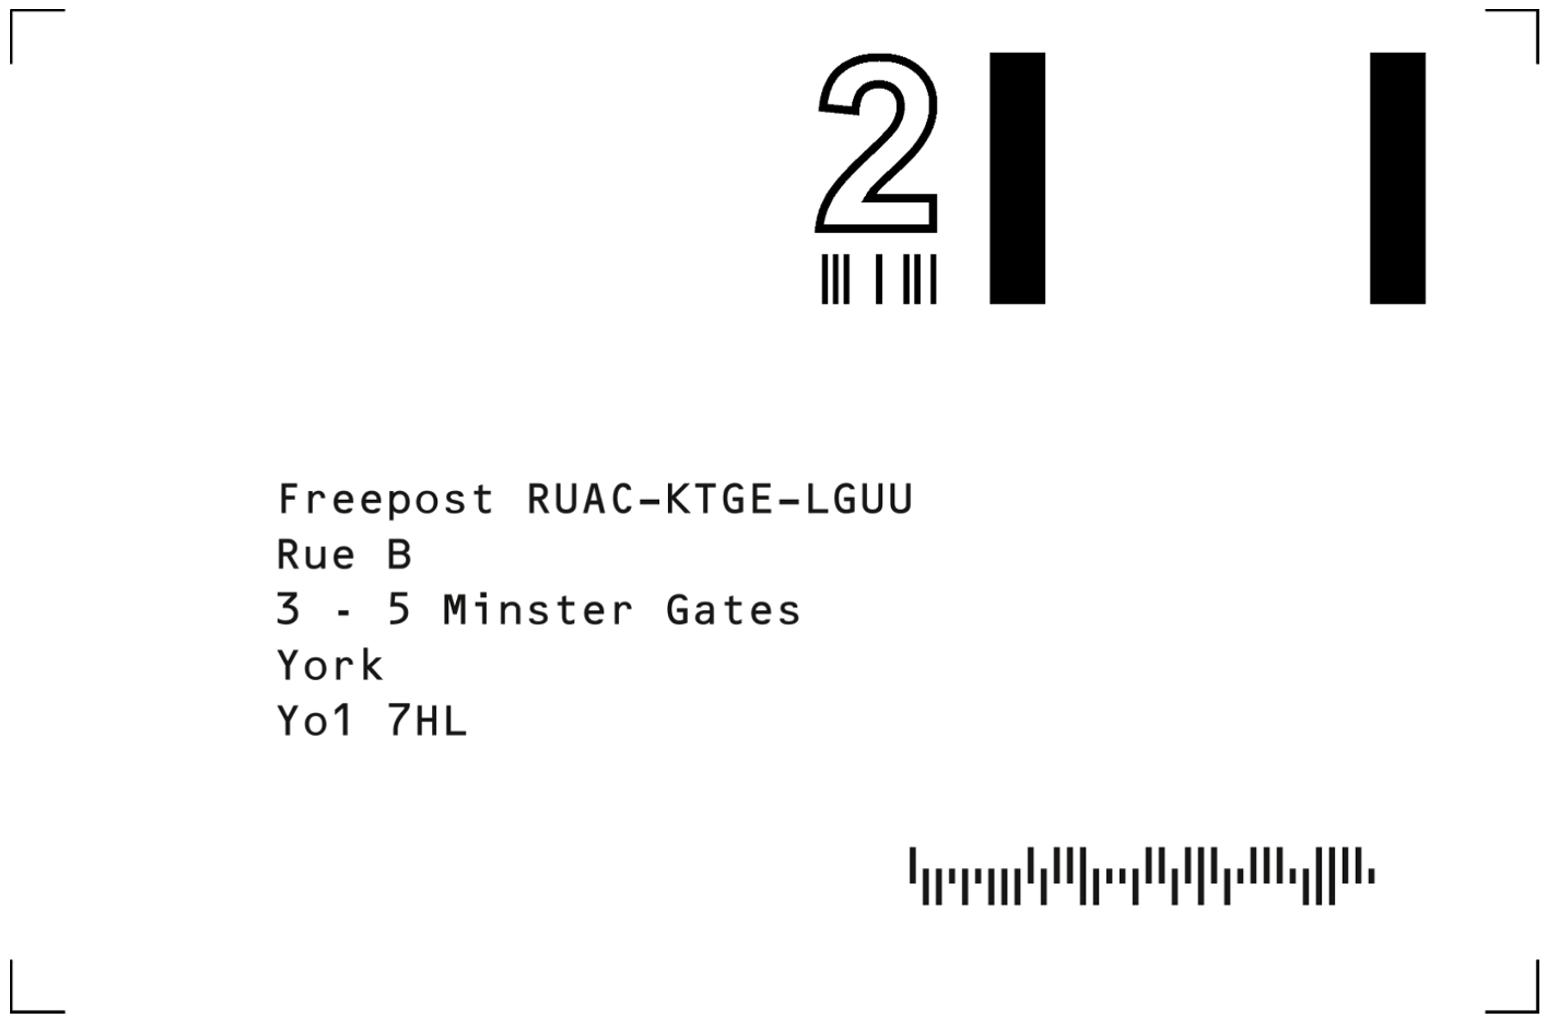 rueb jewellers york freepost label